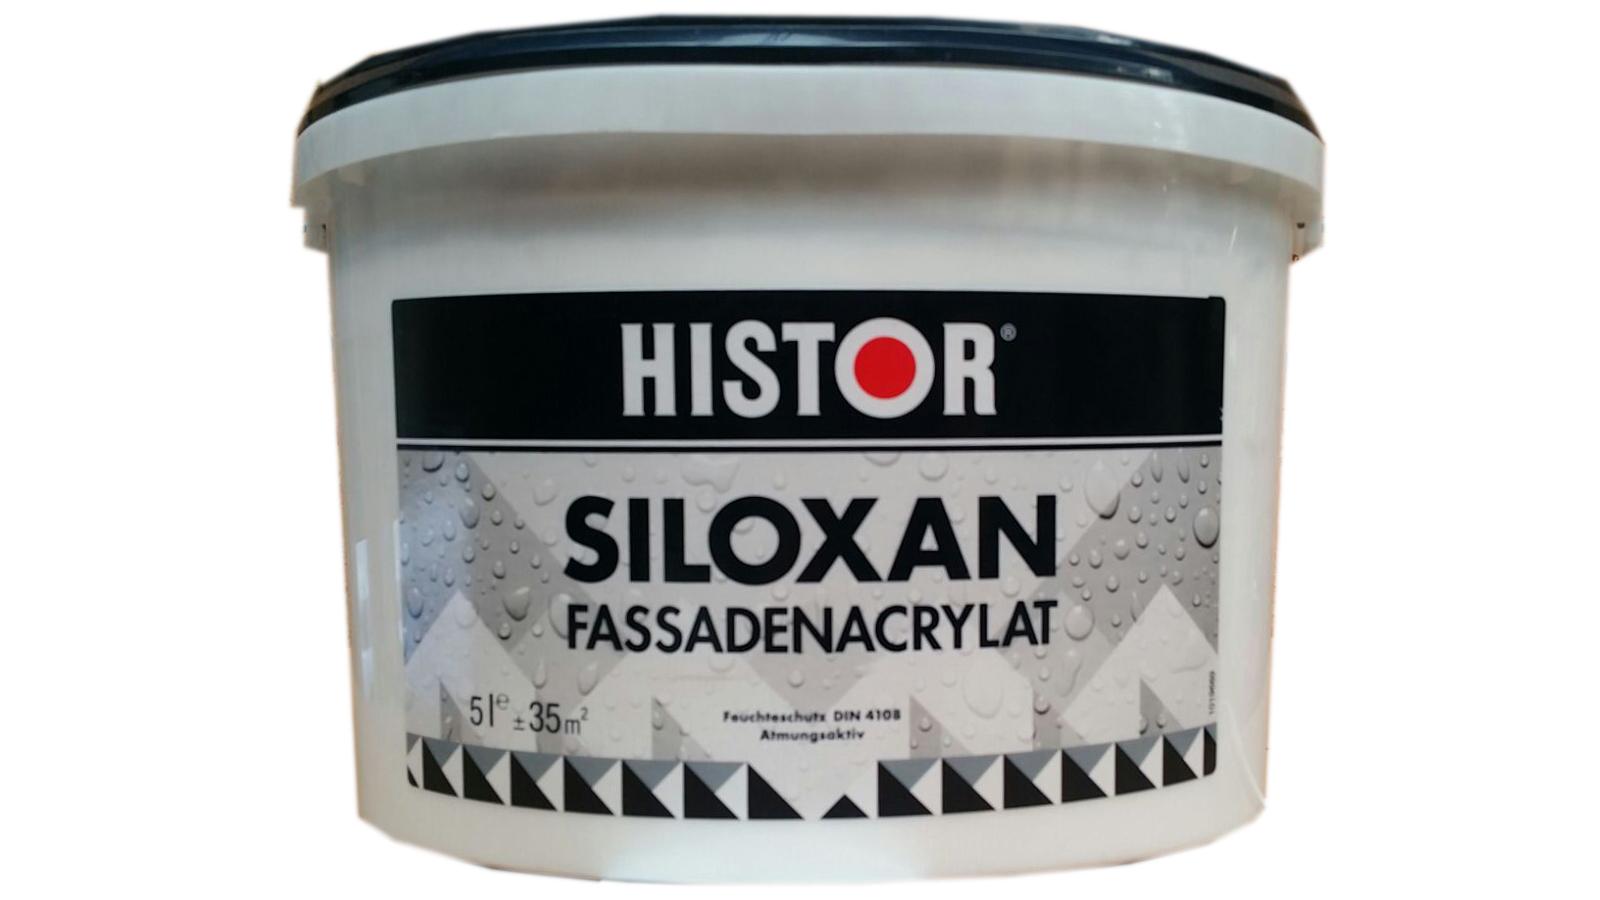 Histor SILOXAN Fassadenacrylat Fassadenfarbe Weiß TuchMatte 2,5 Liter